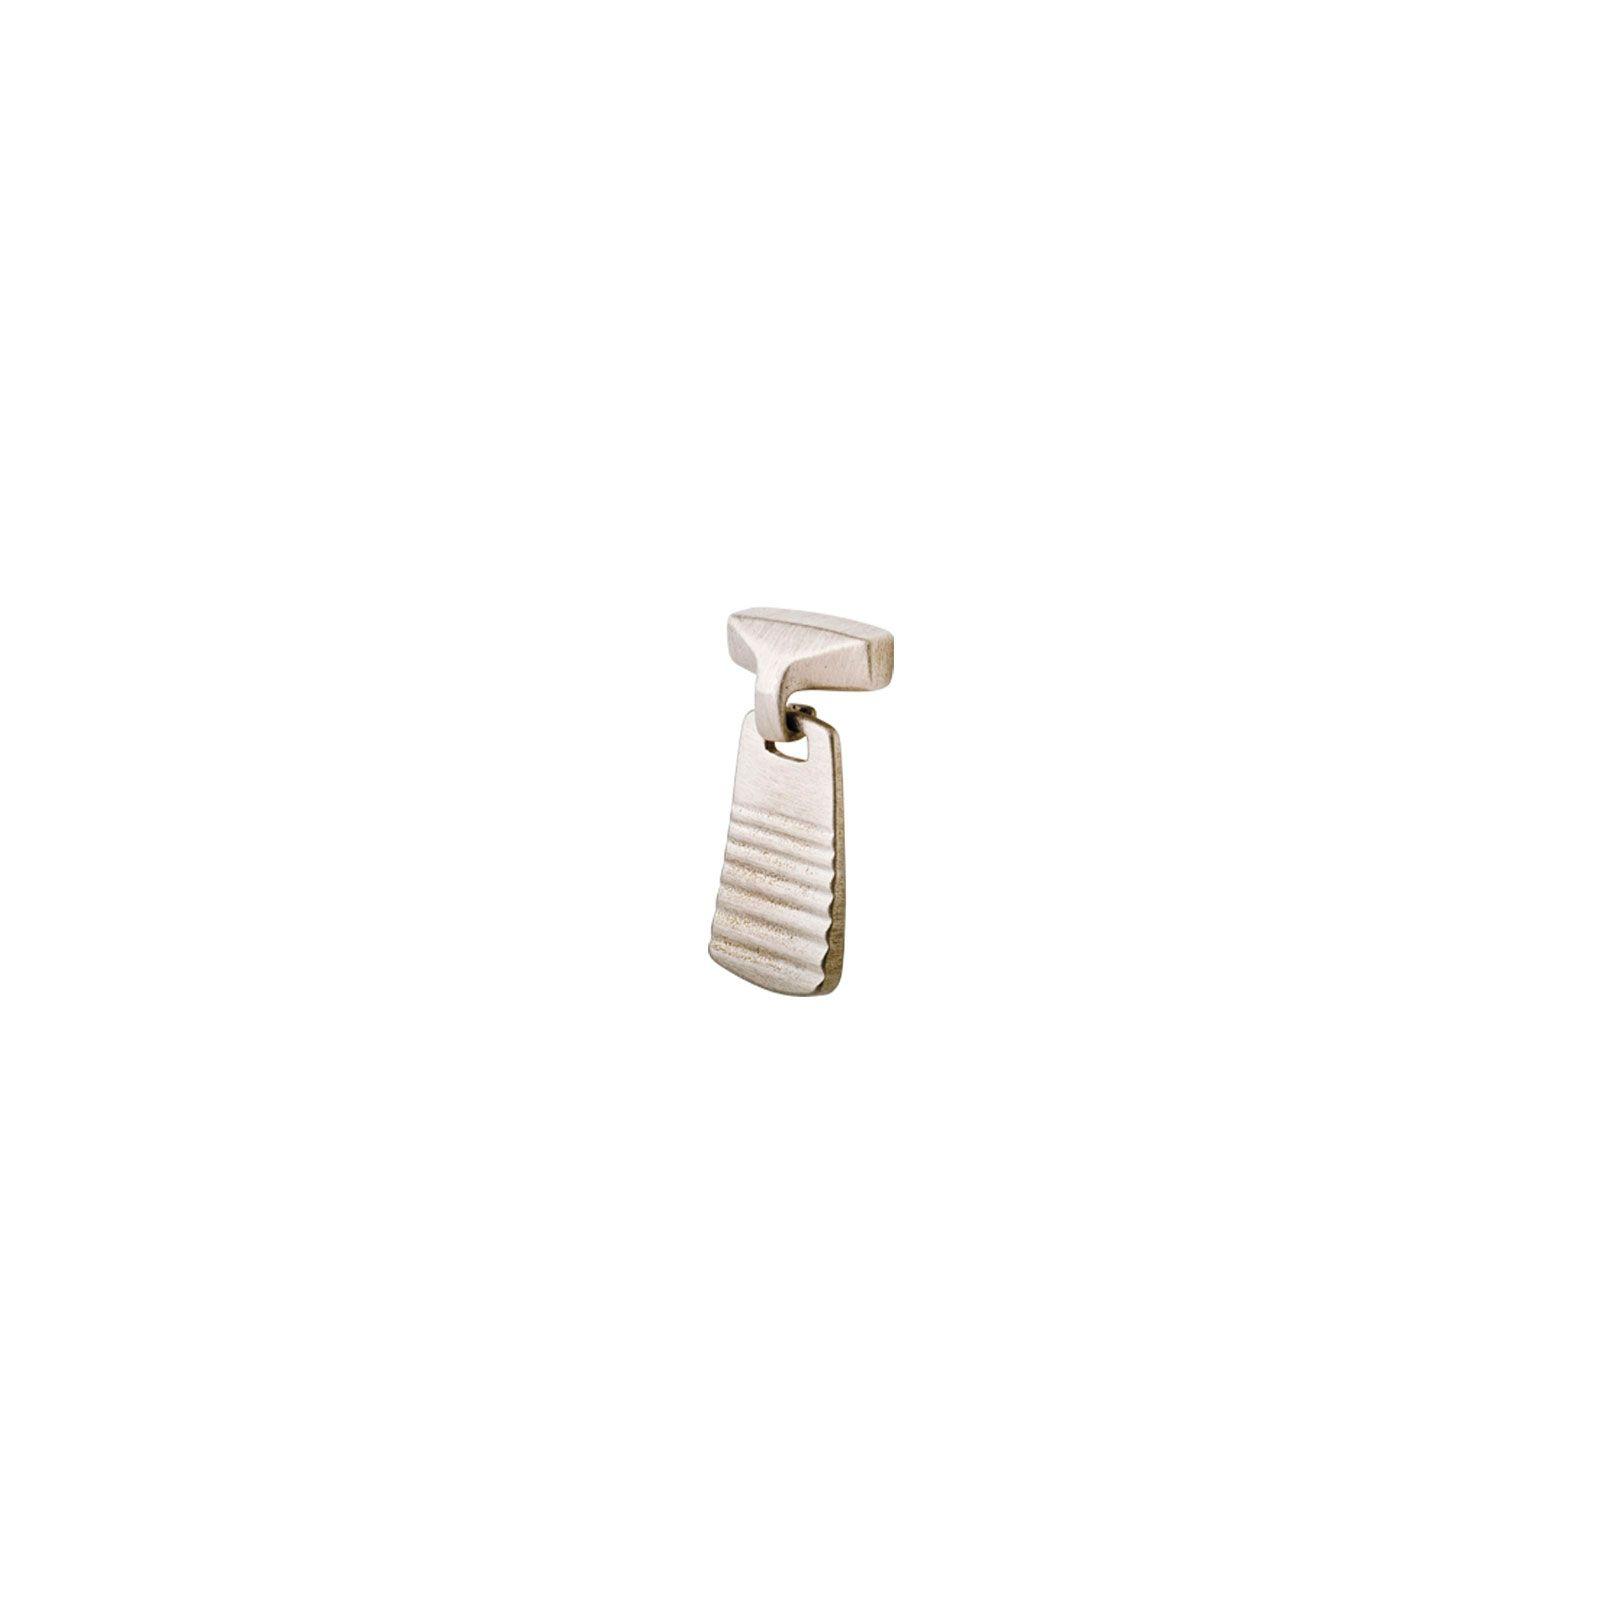 Brut Pendant Cabinet Pull 2 7 16 Rocky Mountain Hardware